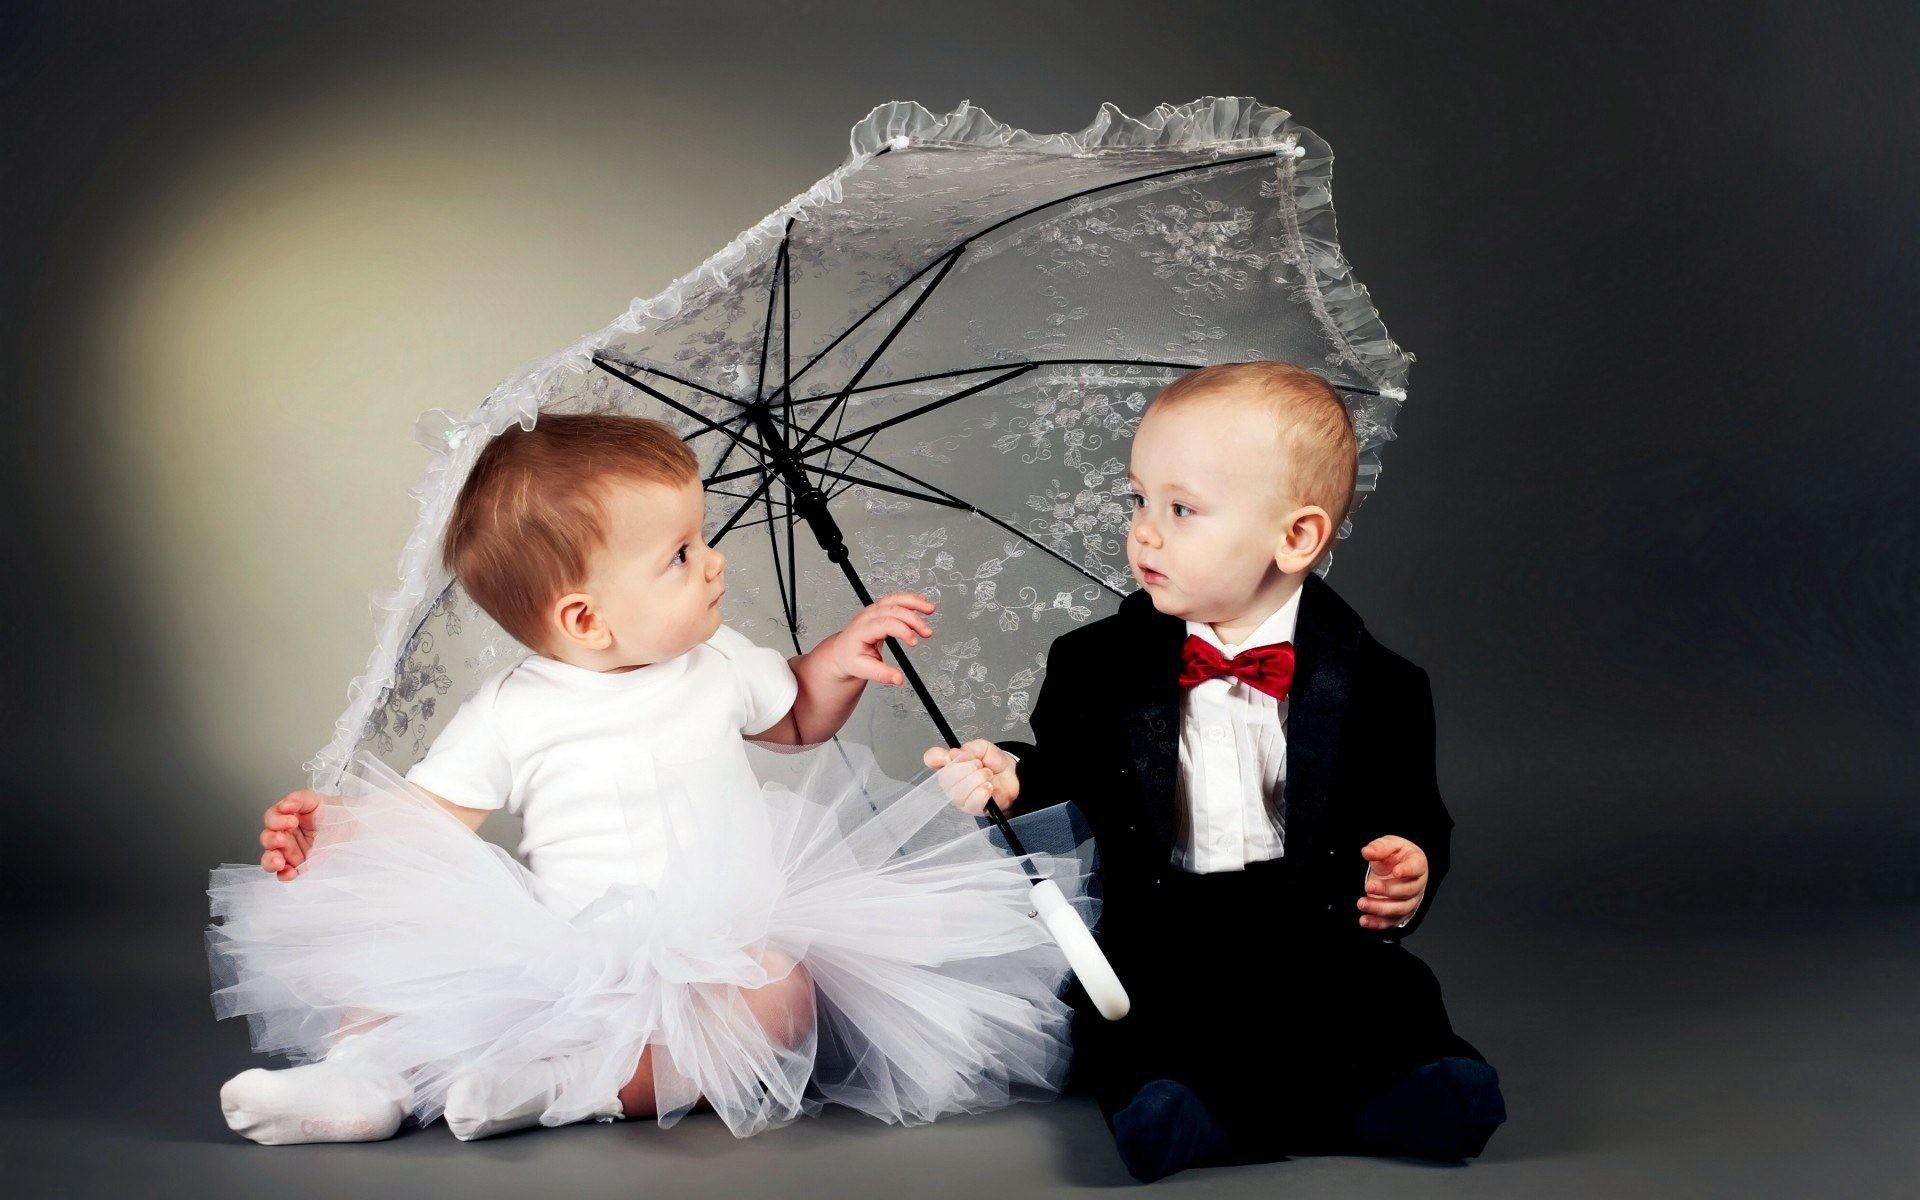 Cute-wedding-baby-couple-wallpaper